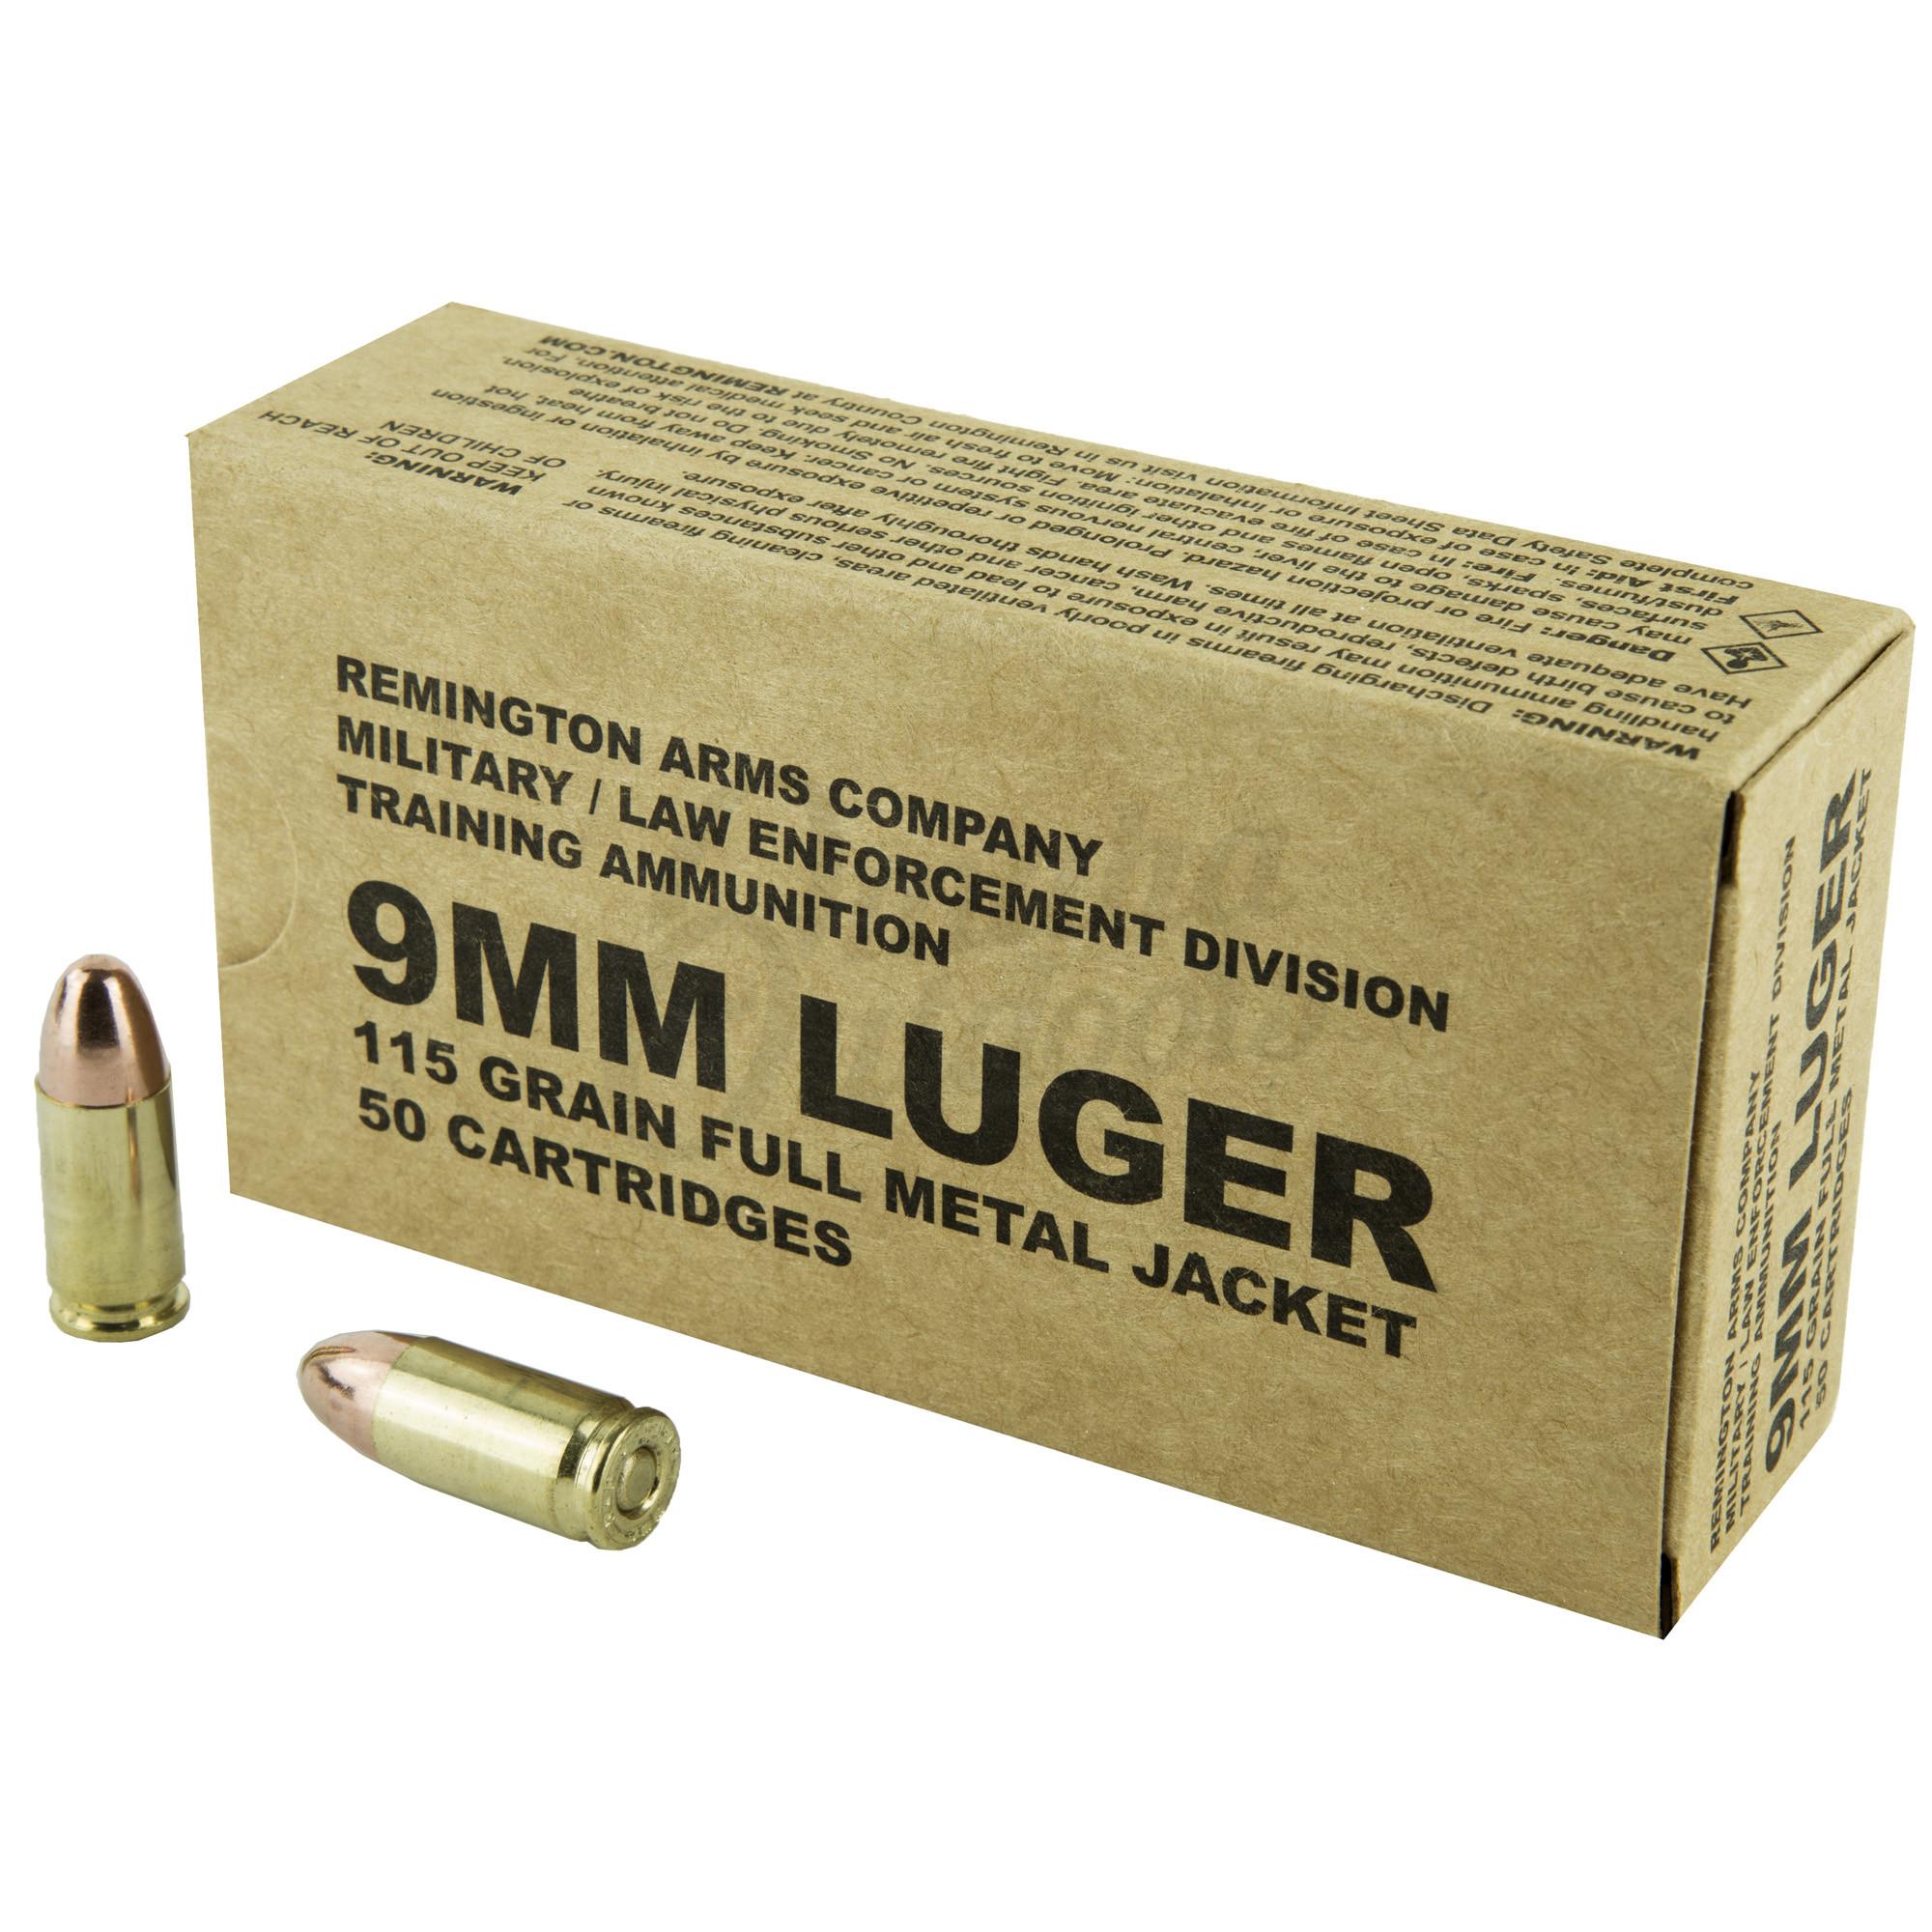 Remington MIL/LE Training 9mm Ammo 115 Grain FMJ 50 Round Box